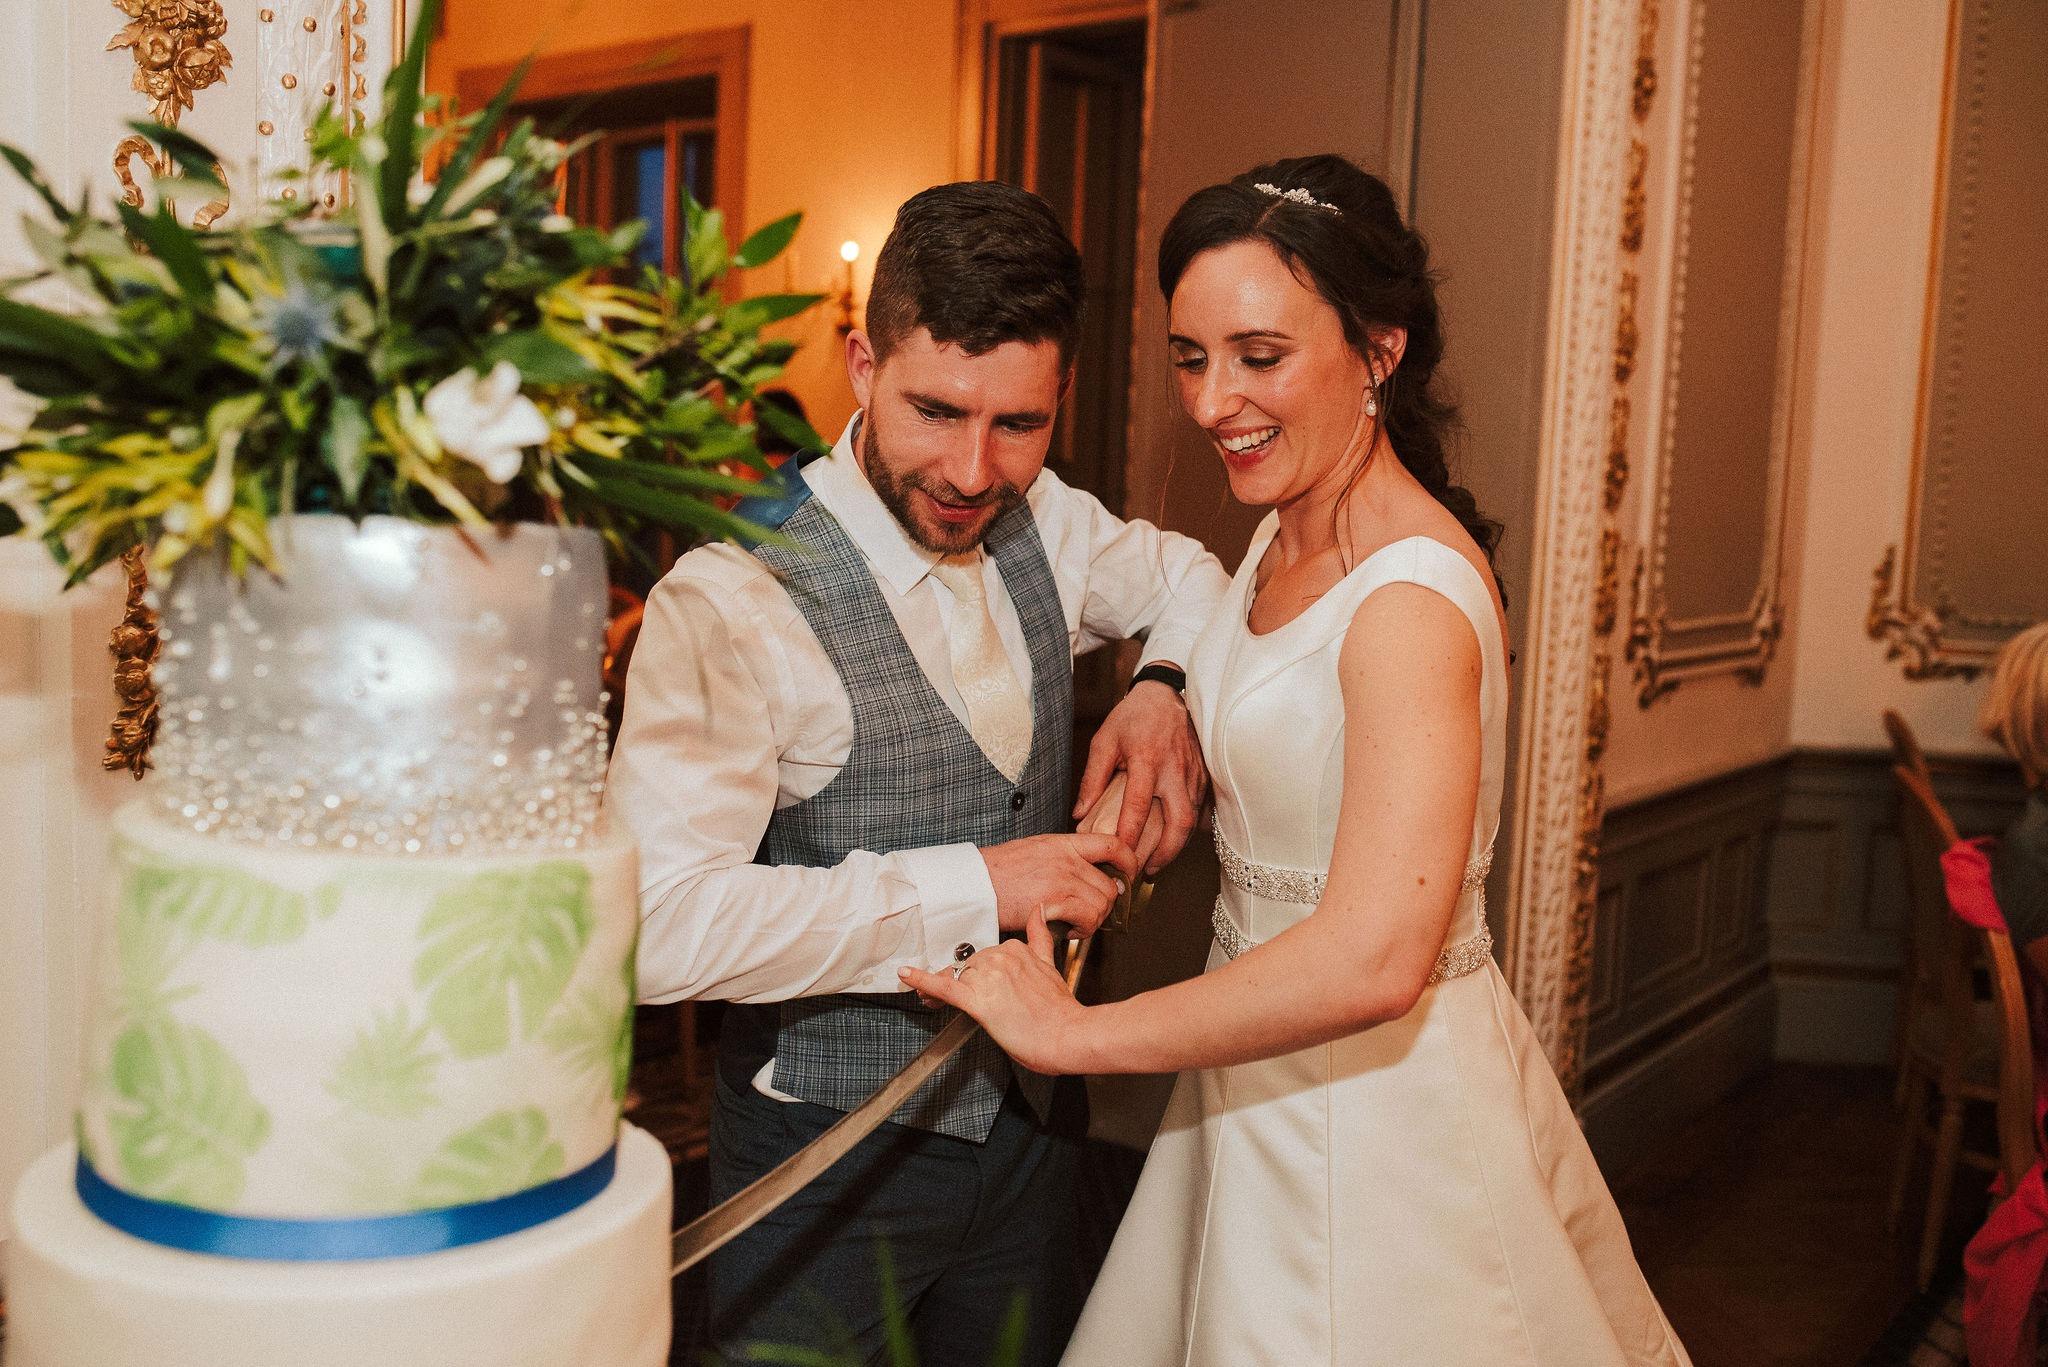 A man and woman cutting a wedding cake